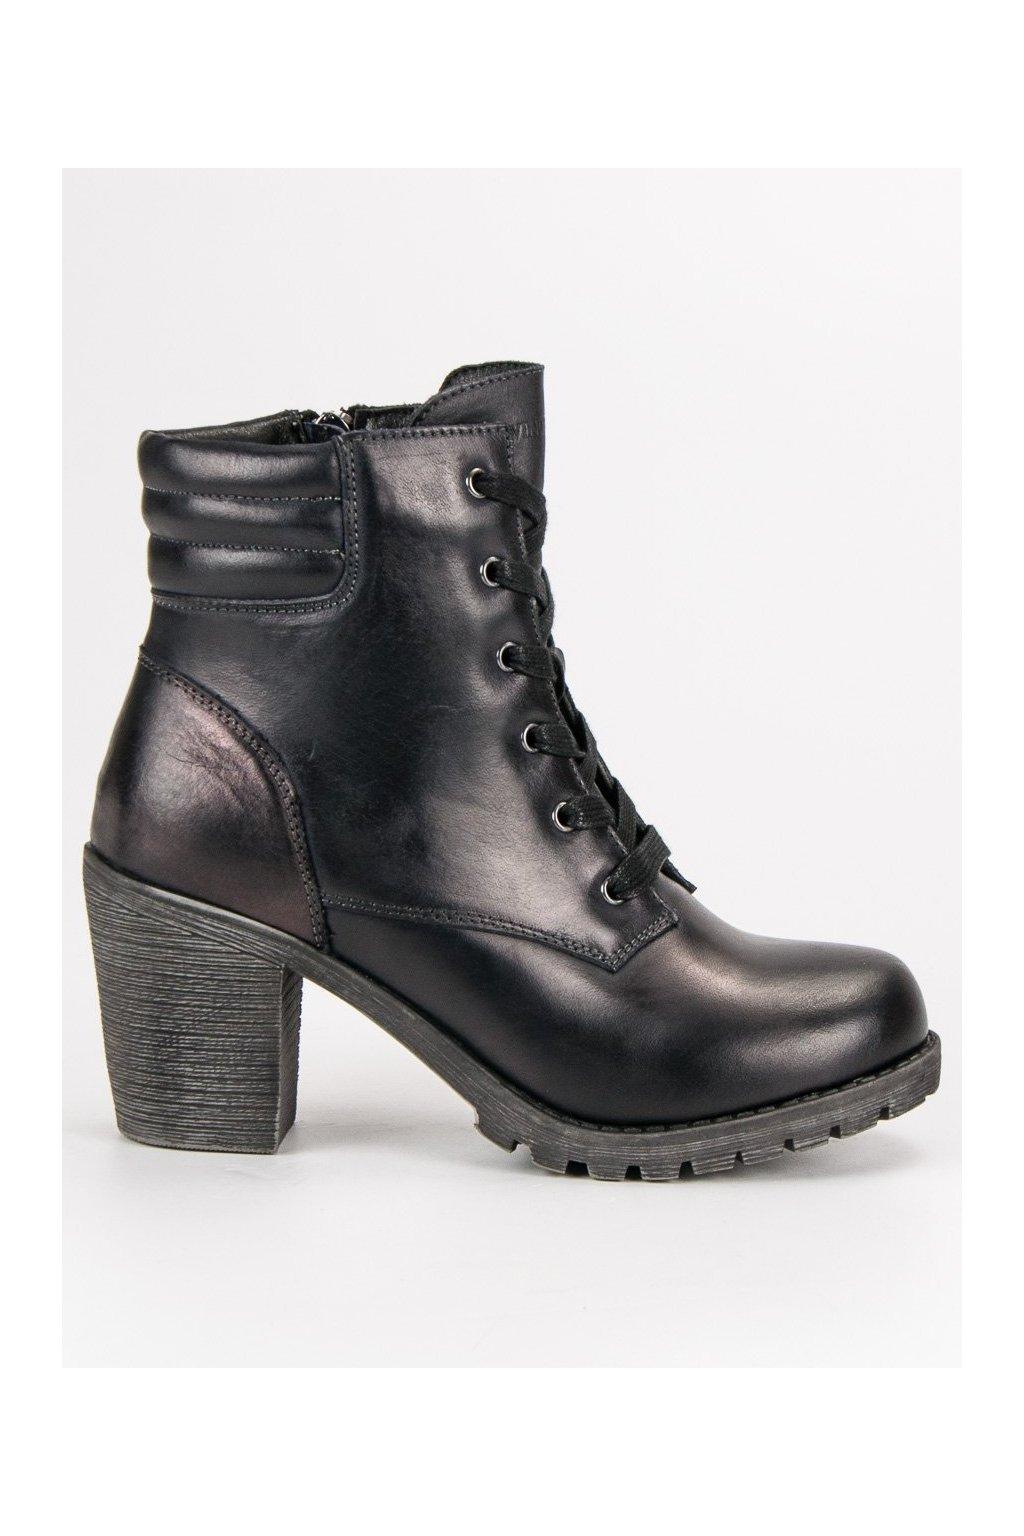 Čierne topánky pre ženy členkové čižmy na opätku VINCEZA c861c37fcf7